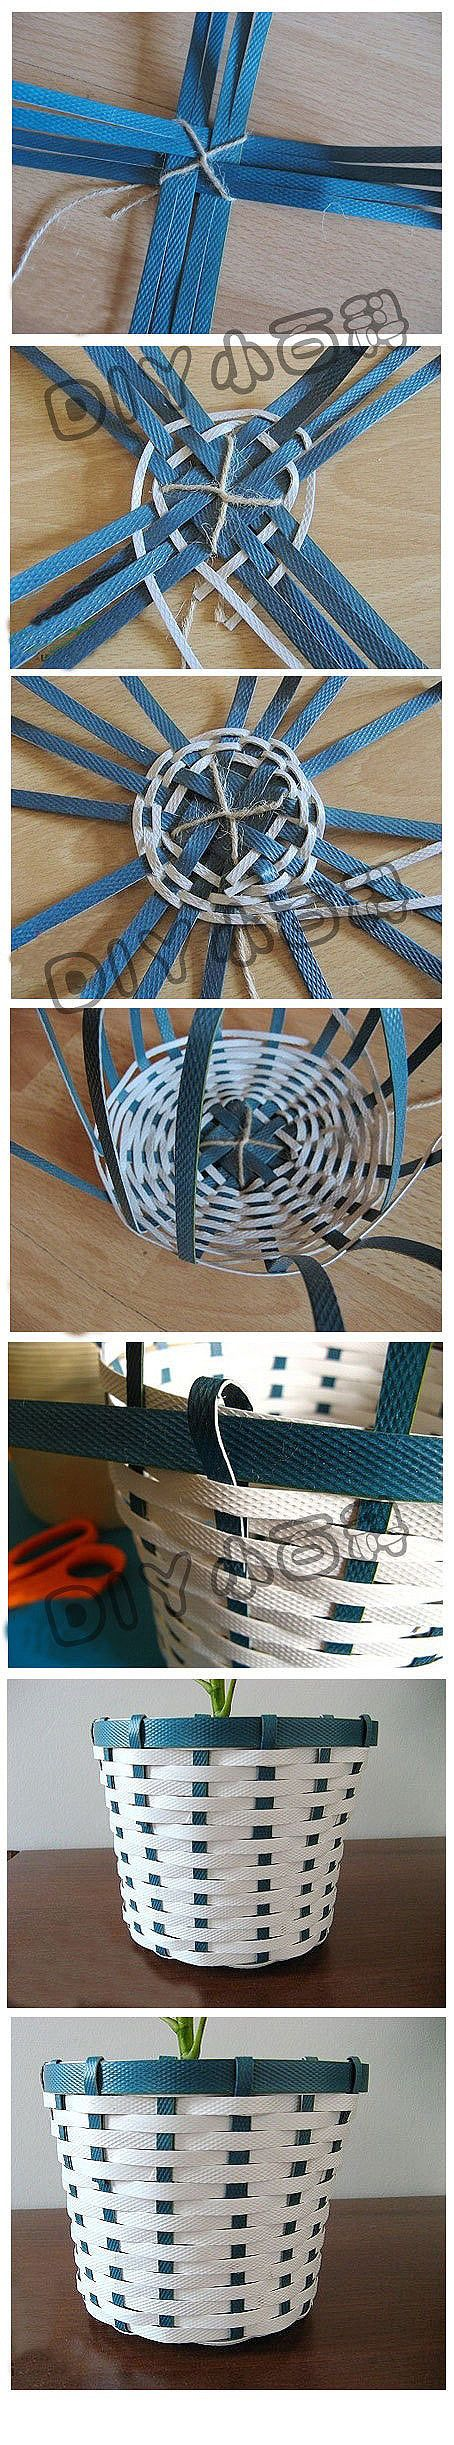 simple basket weaving instructions